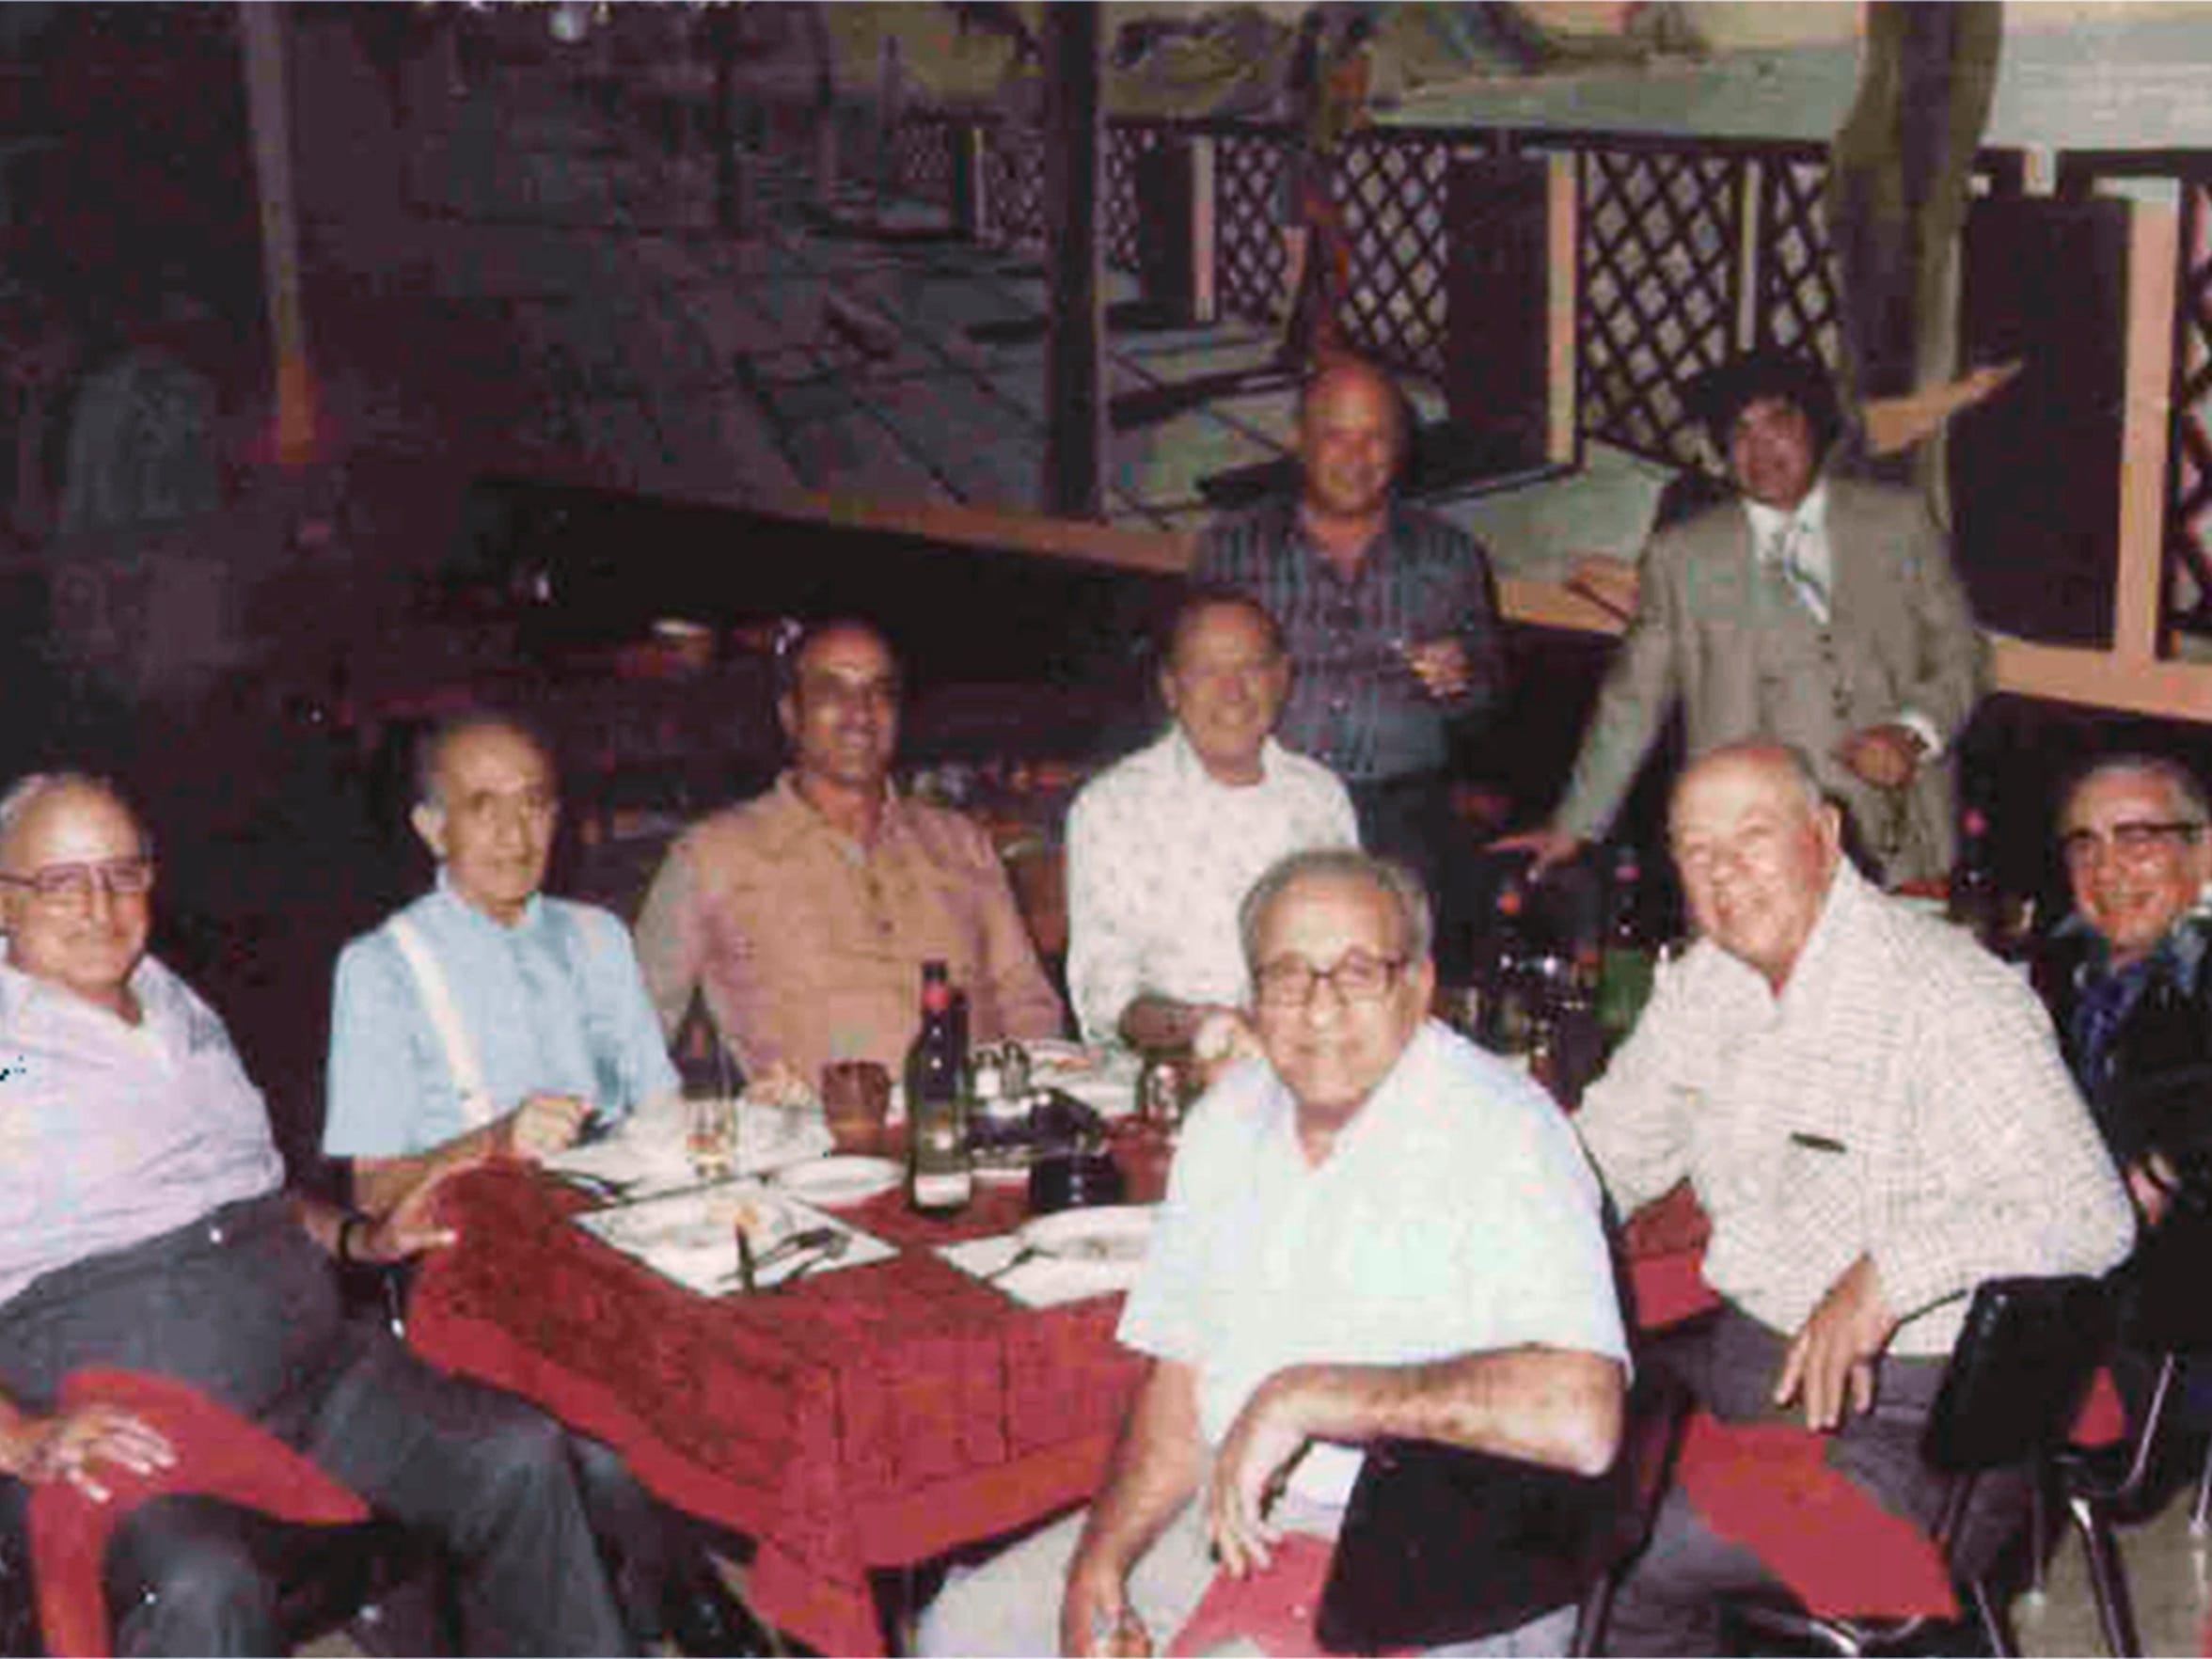 "A 1978 photo provided by the U.S. Attorney's office, Northern District of Illinois, shows alleged organized crime figures seen at a Chicago area restaurant. Clockwise from left are: Joseph ""Doves"" Aiuppa, Martin Accardo (tentative identification), Vincent Solano, Alfred Pilotto, John ""Jackie the Lackey"" Cerone, Joseph ""The Clown"" Lombardo, Joseph ""Little Caesar"" DiVarco, Joseph ""Black Joe"" Amato and Anthony J. ""Big Tuna"" Accardo."